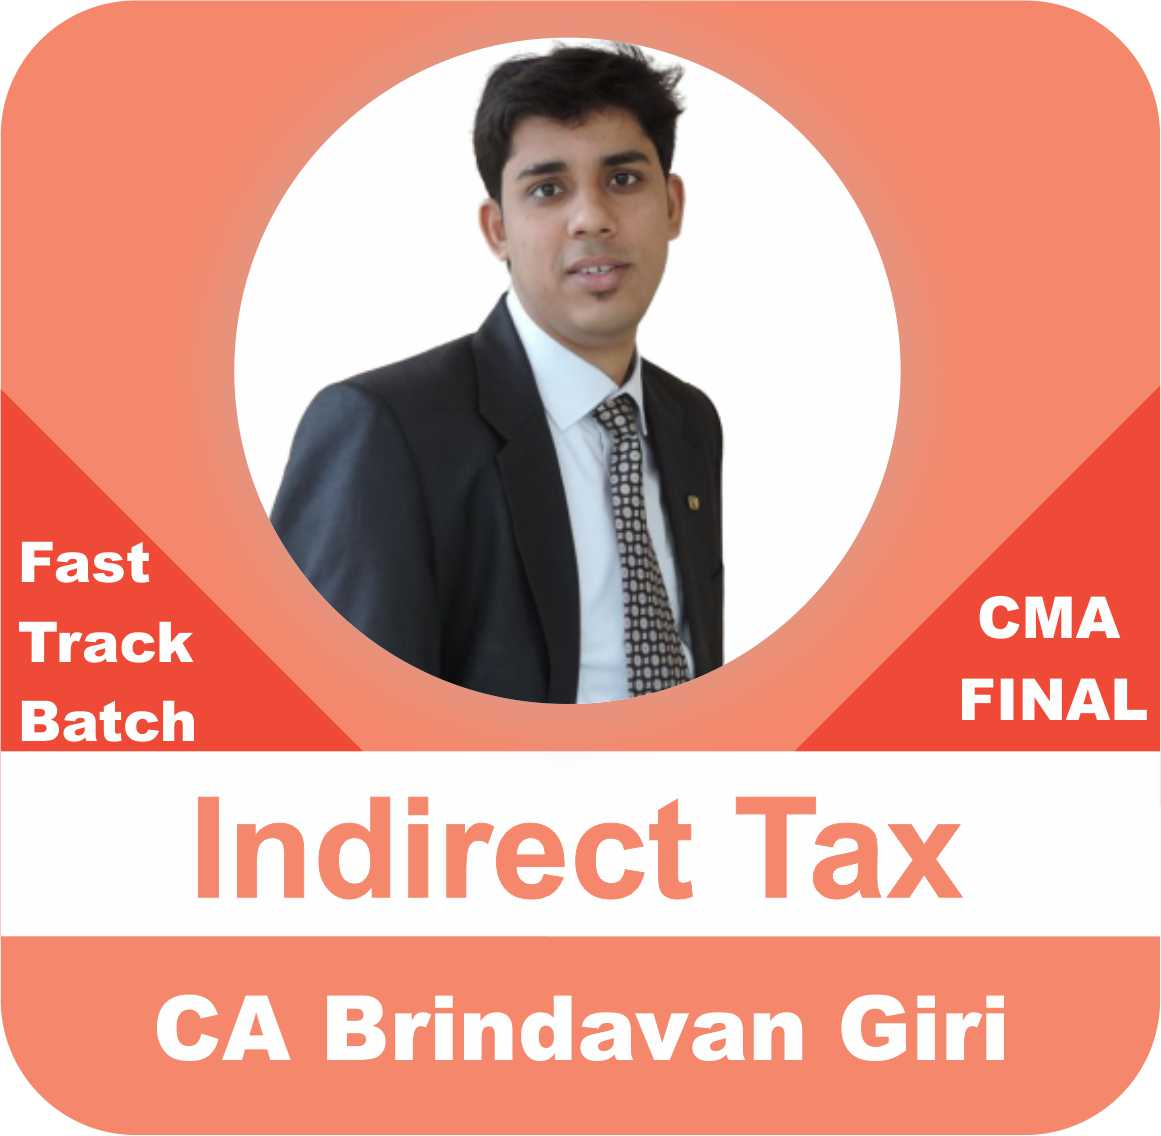 Indirect Tax Fast Track Batch